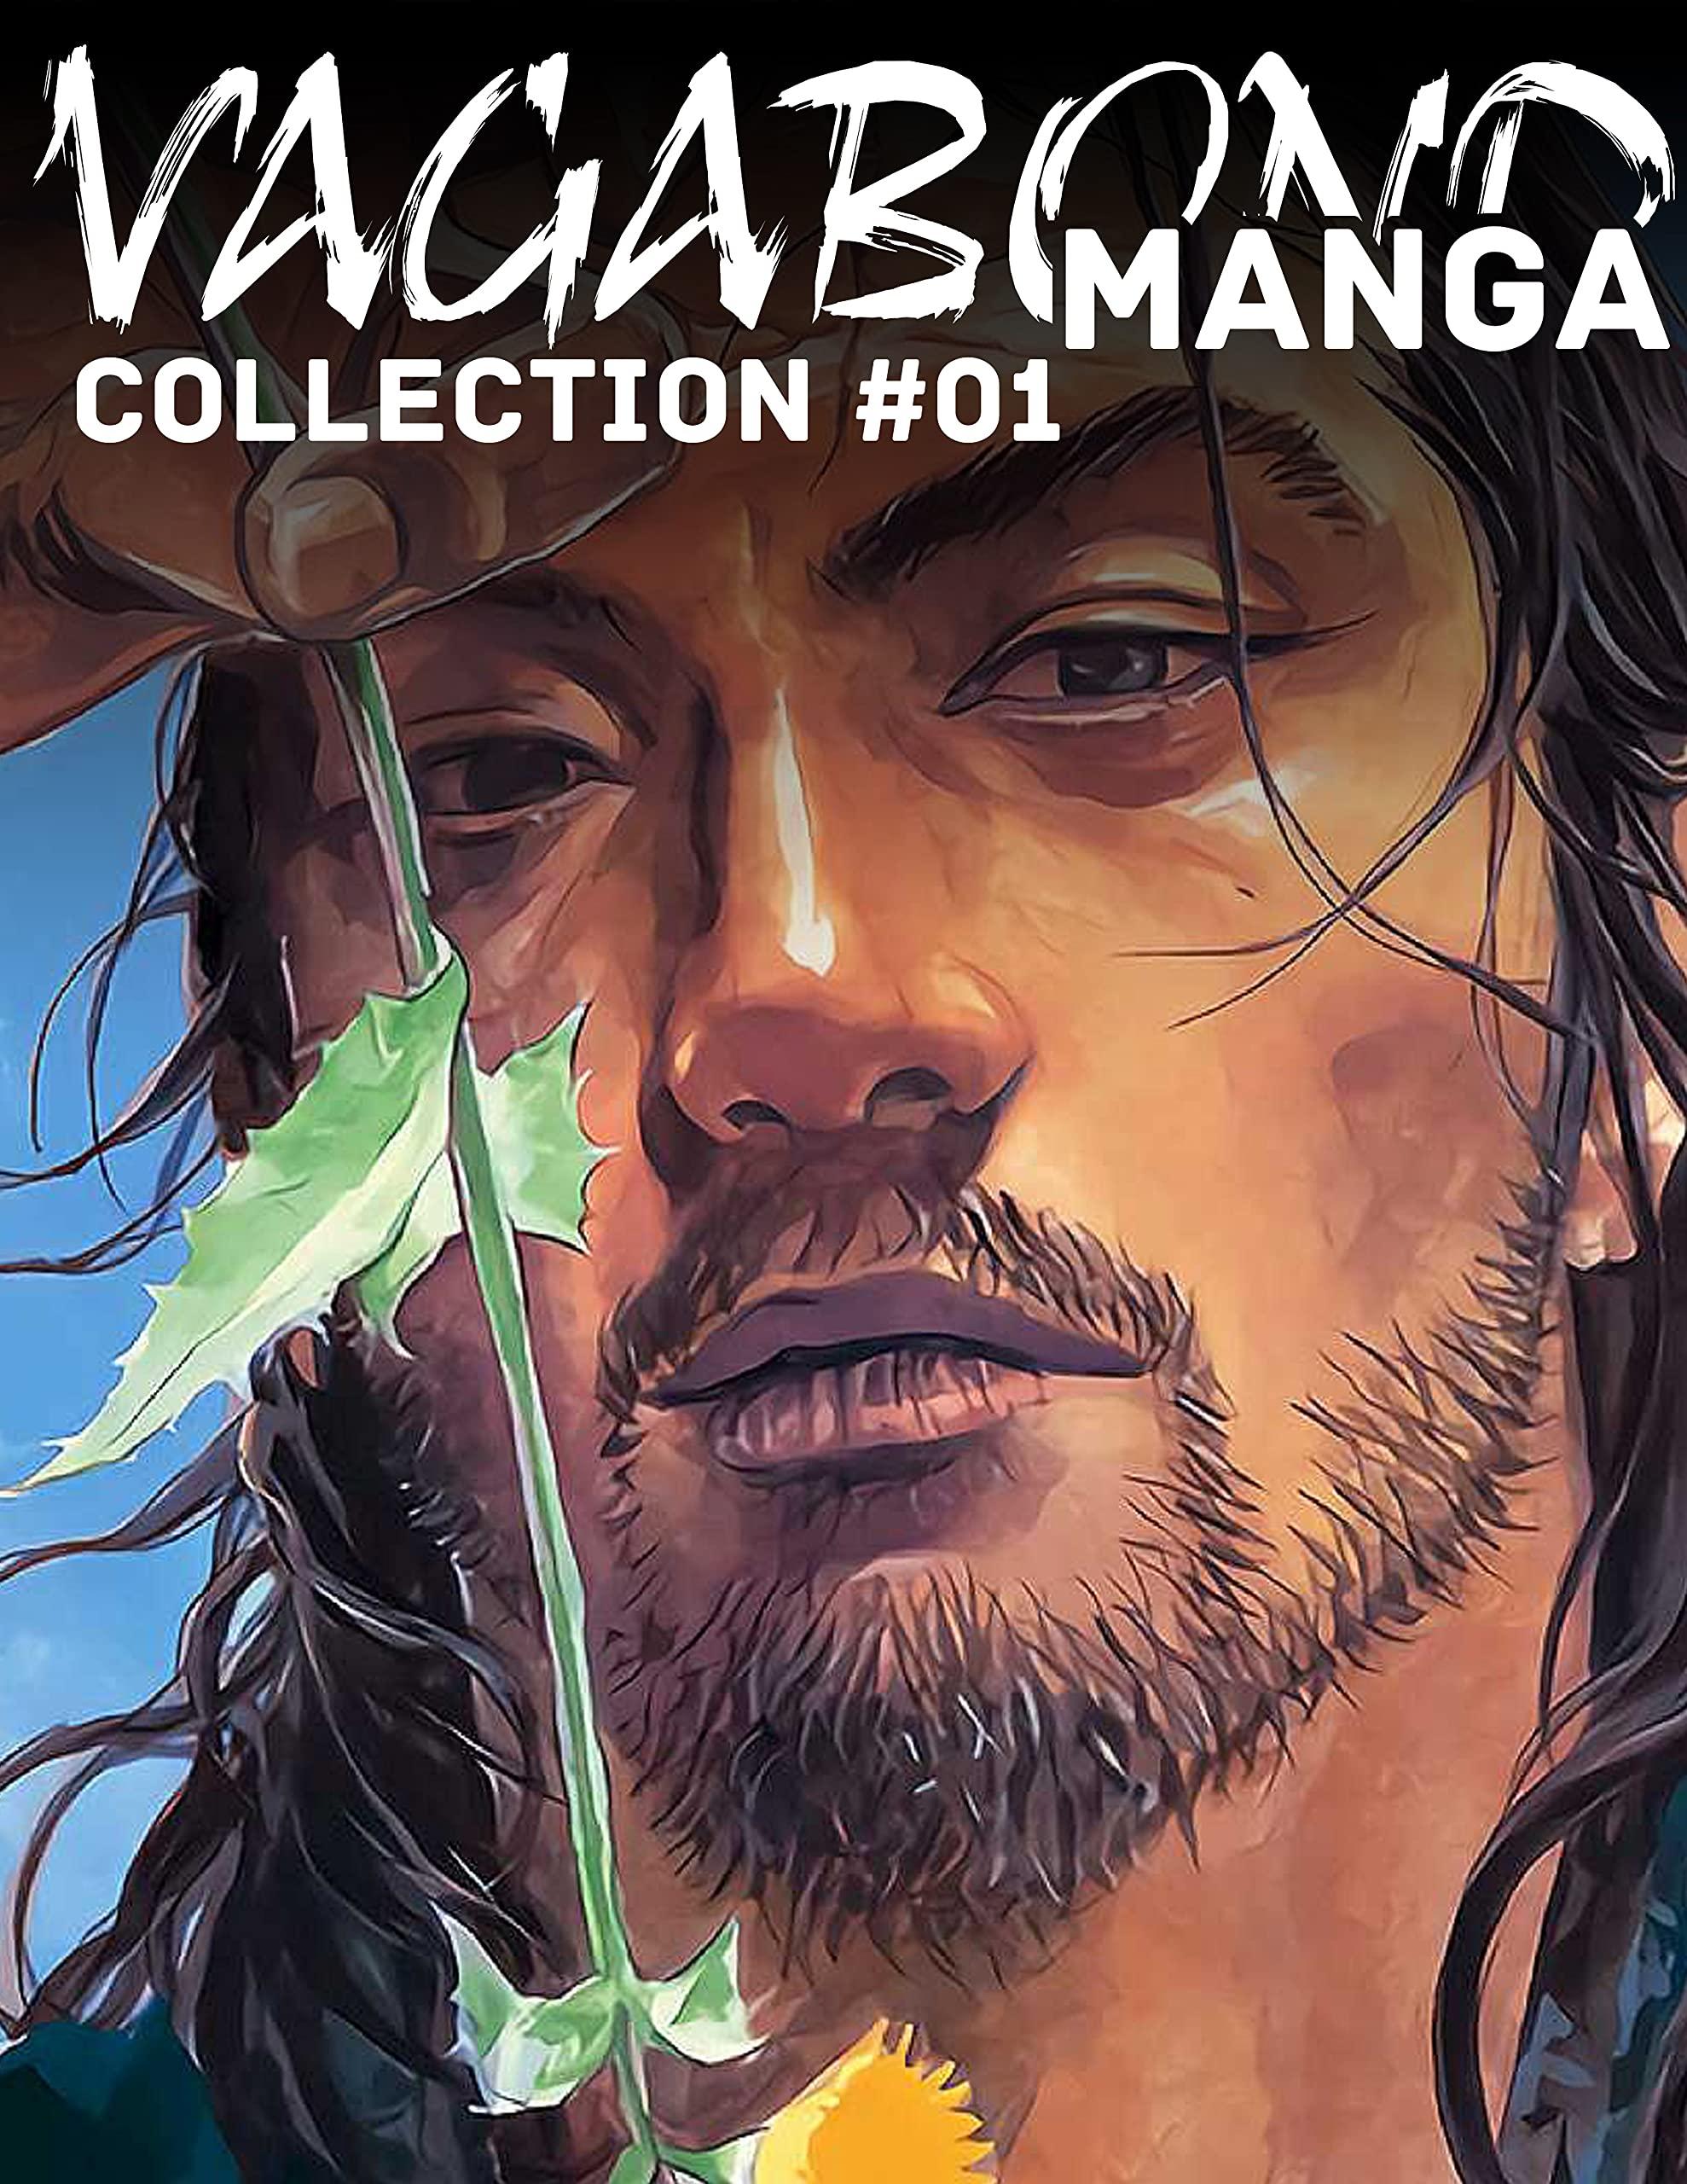 Vagabondd: manga books Box Set Omnibus Vol 1 vagabond manga full box set | For Epic, Historical Fiction, Martial Arts FAN